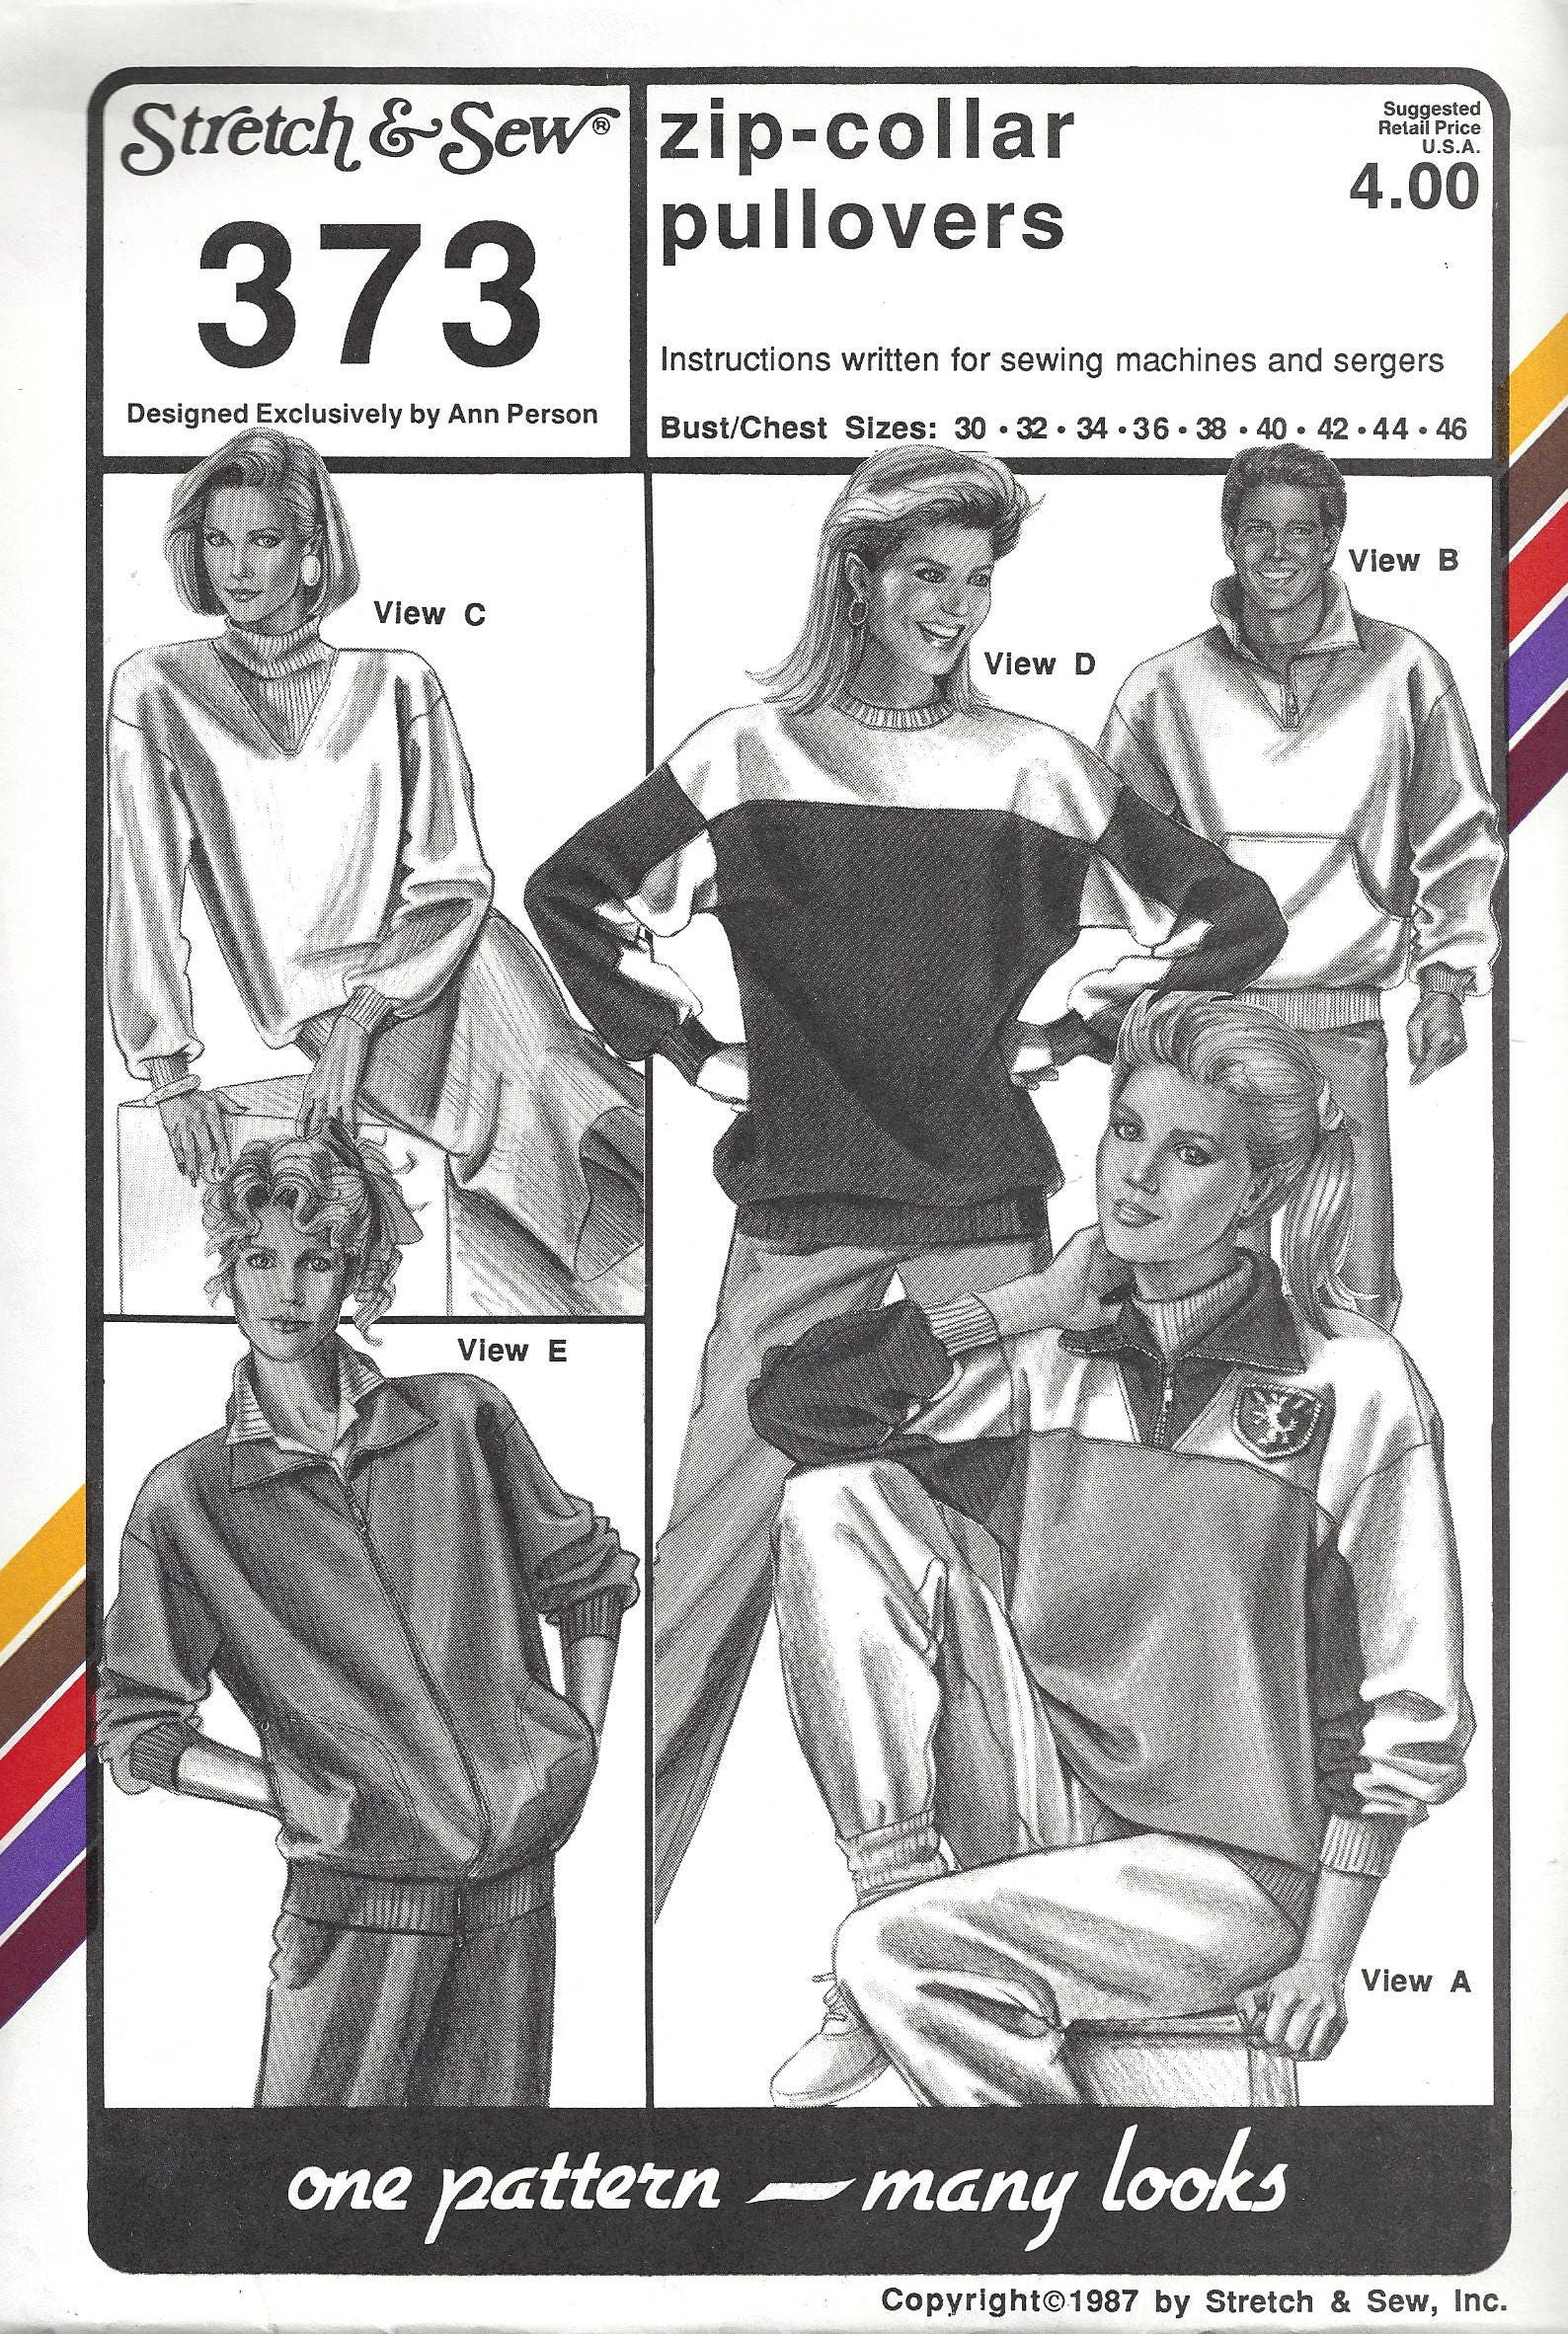 Strecke & Nähen 373 Nähen Muster Damen Zip-Kragen Pullover